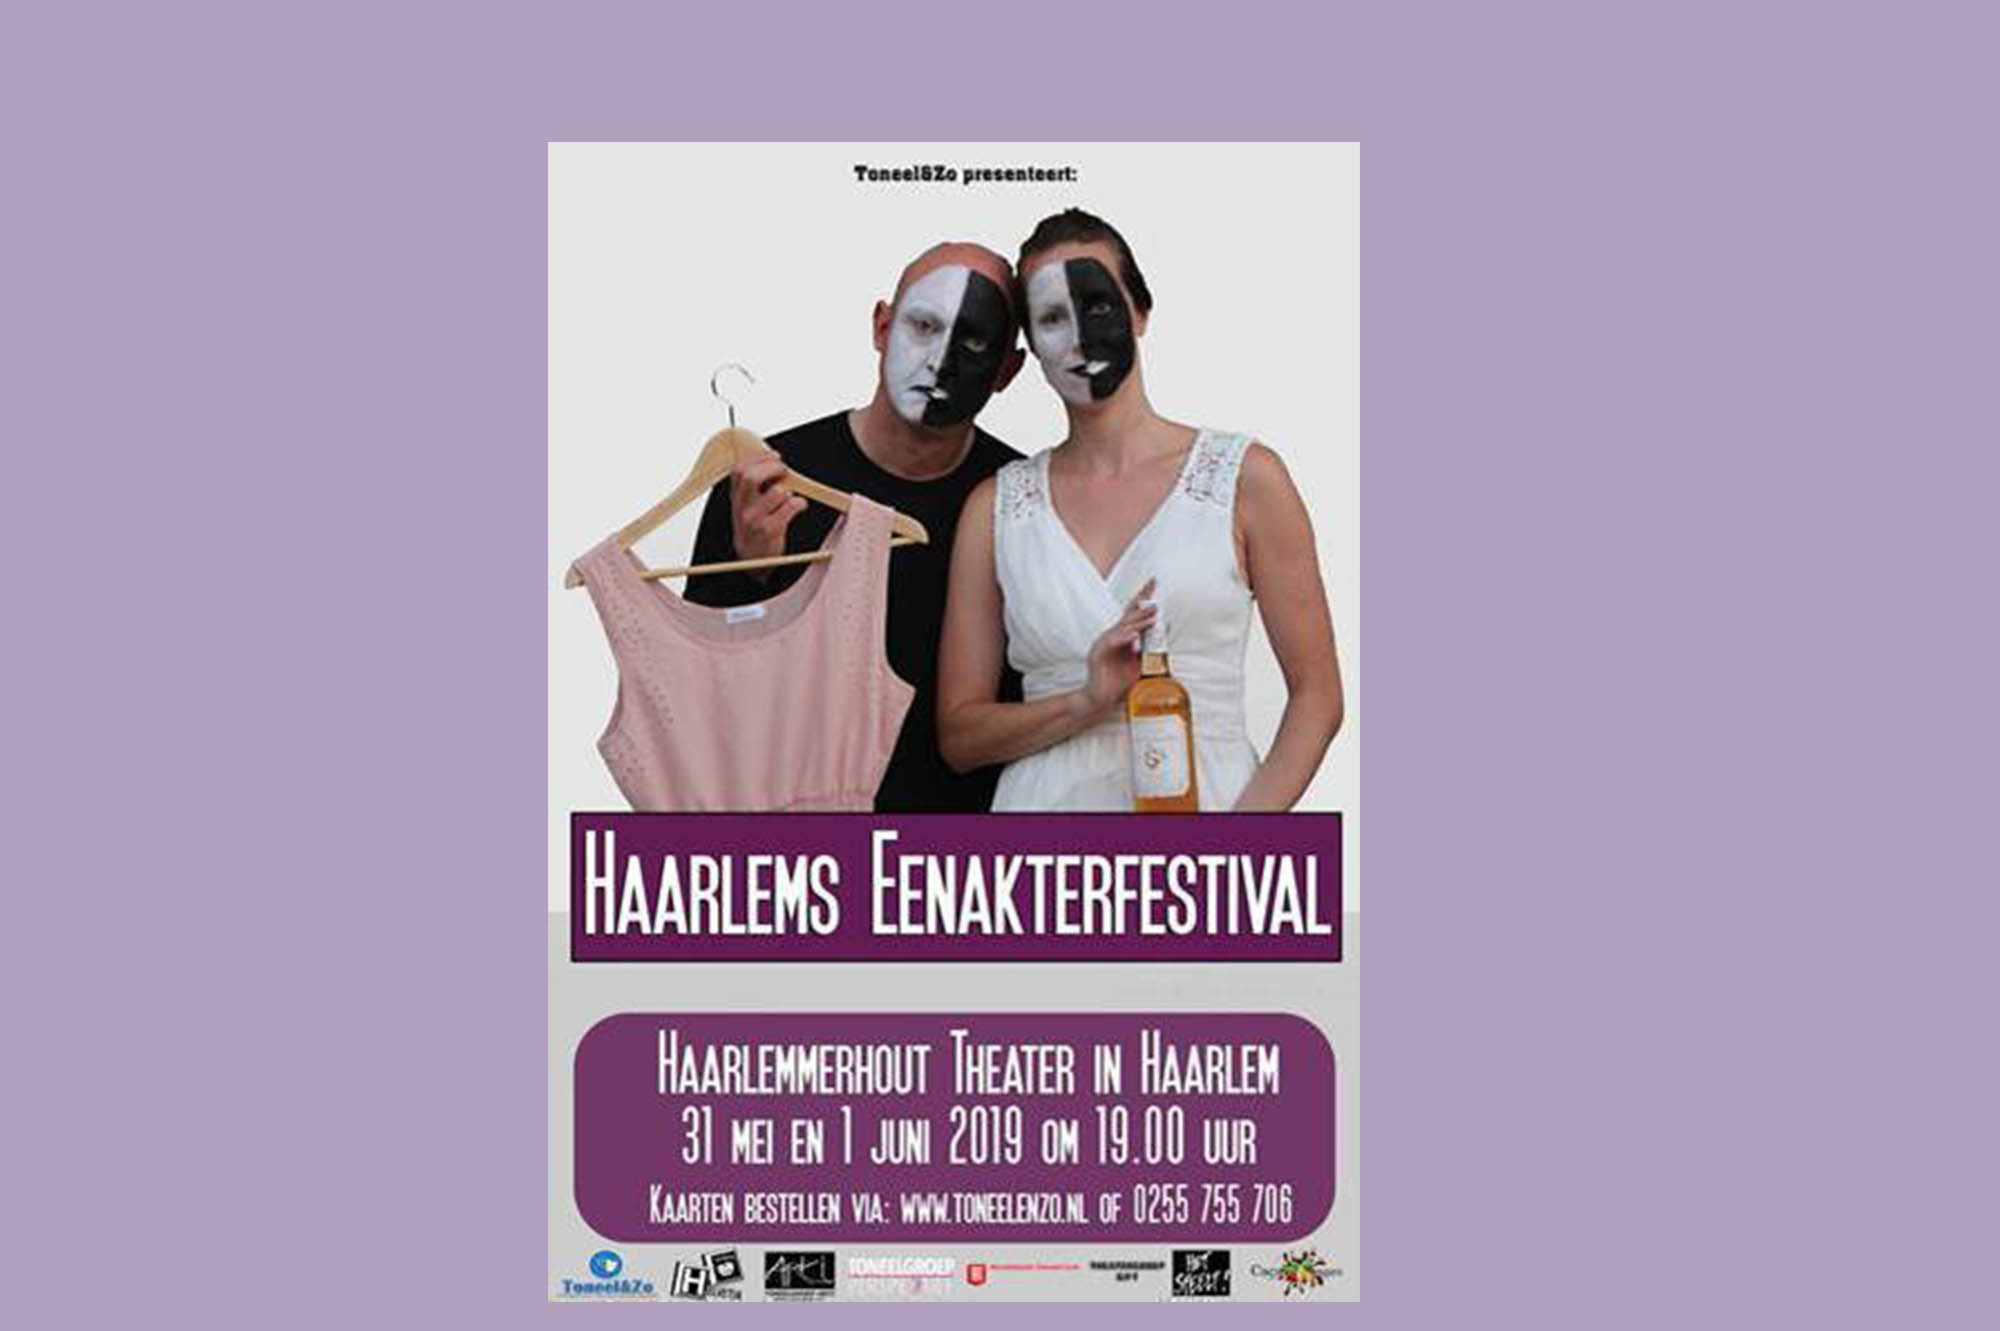 Haarlems Eenakterfestival In Het Haarlemmerhout Theater